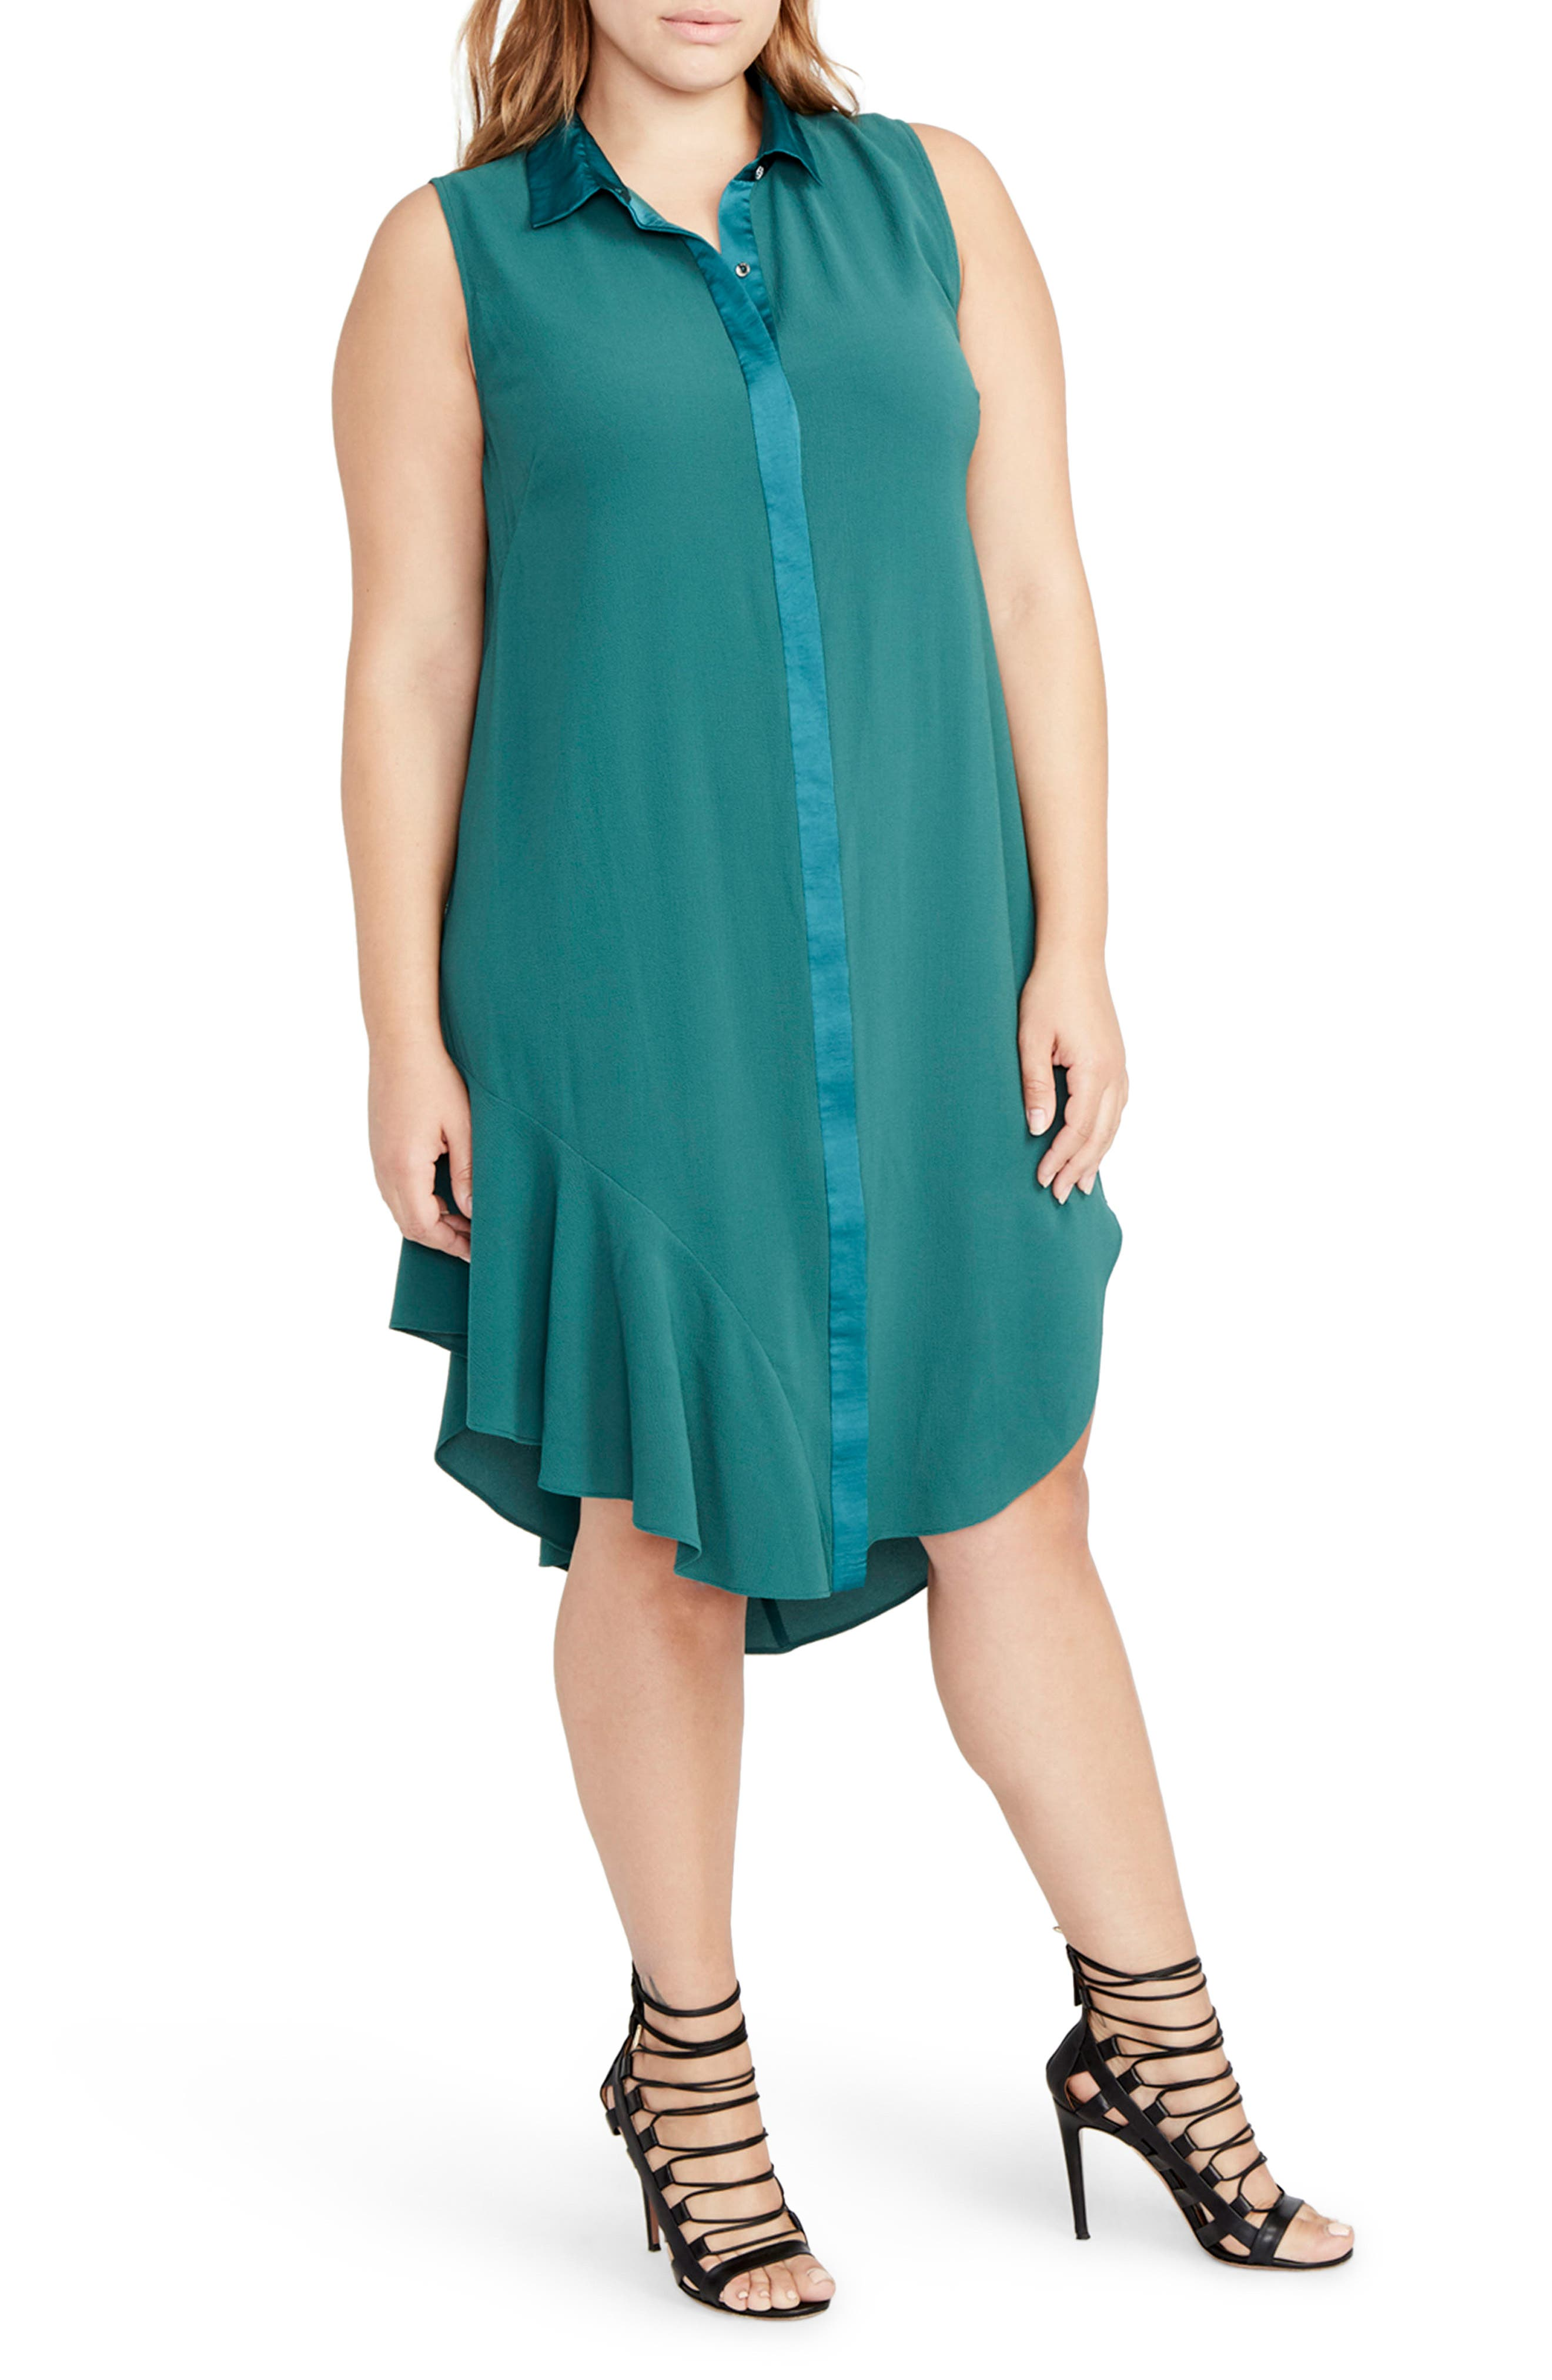 Combo Shirtdress,                             Main thumbnail 1, color,                             Viridian Green